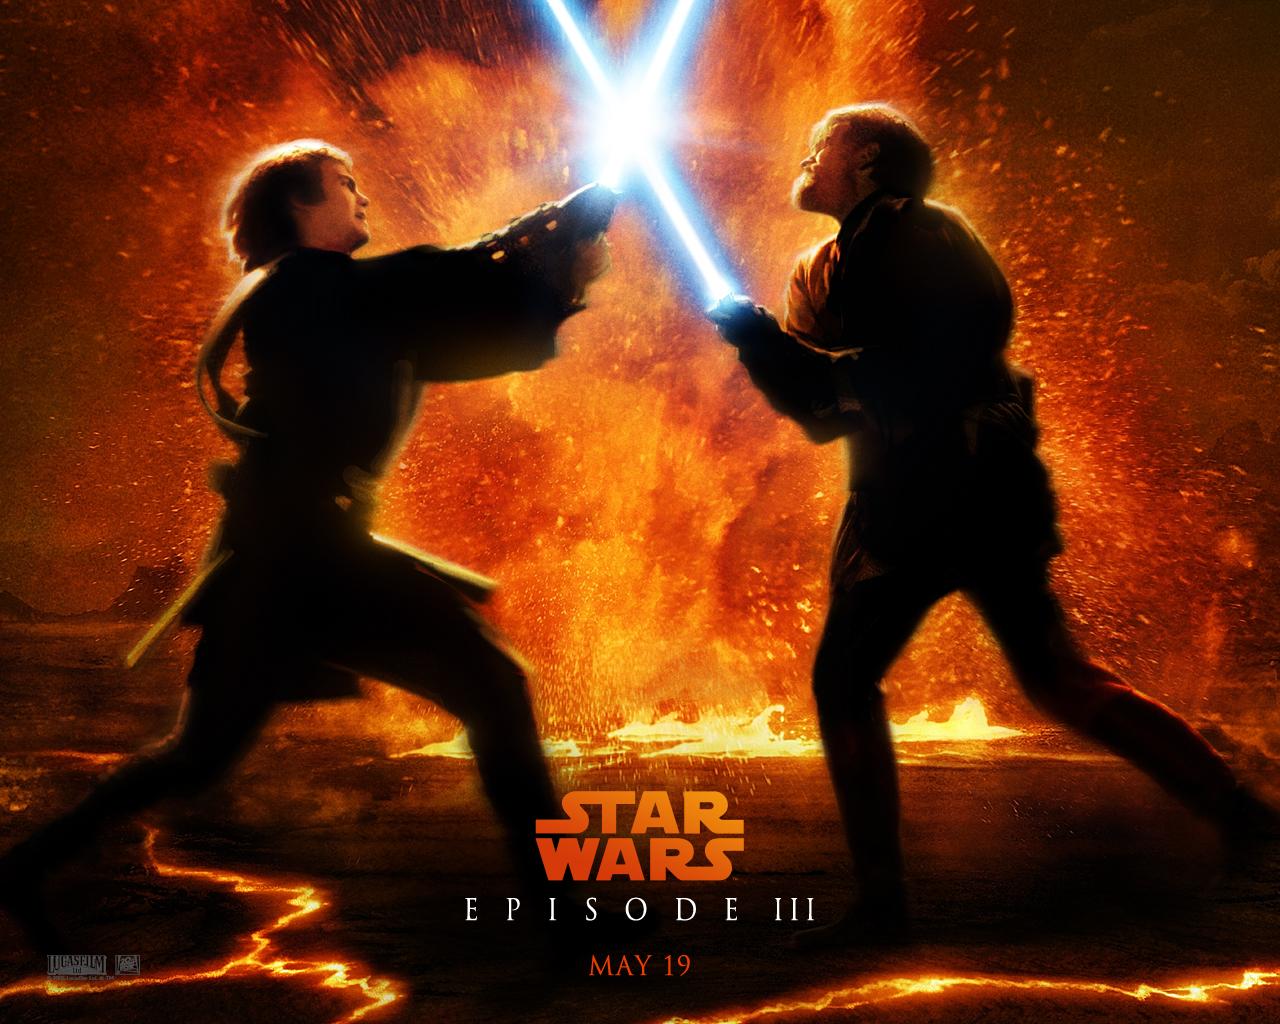 Free Download Wallpaper Wallpaper Star Wars Episode Iii Revenge Of